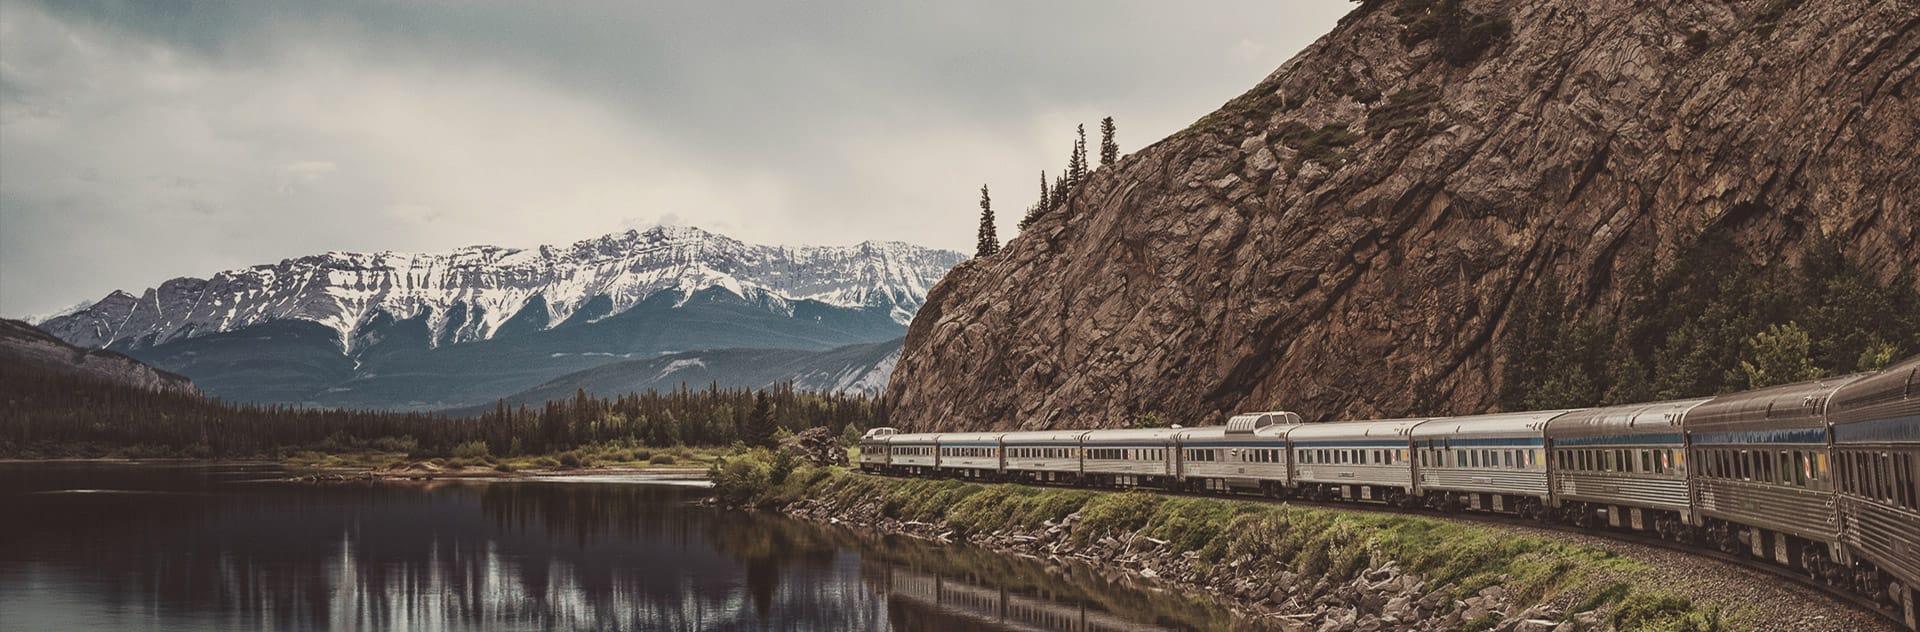 Classes on the Toronto-Vancouver train | VIA Rail